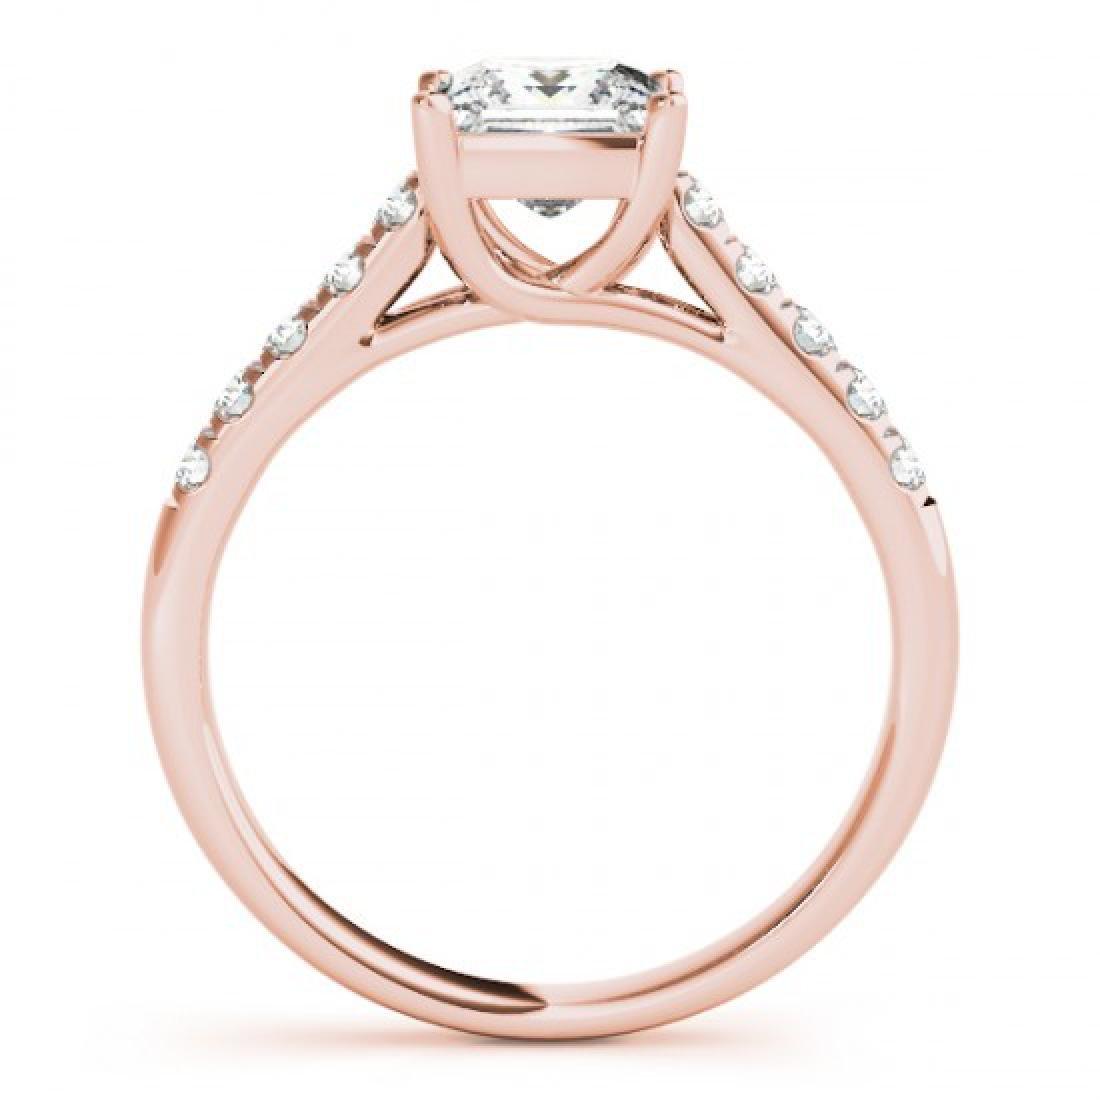 1.3 CTW Certified VS/SI Princess Diamond Ring 14K Rose - 2